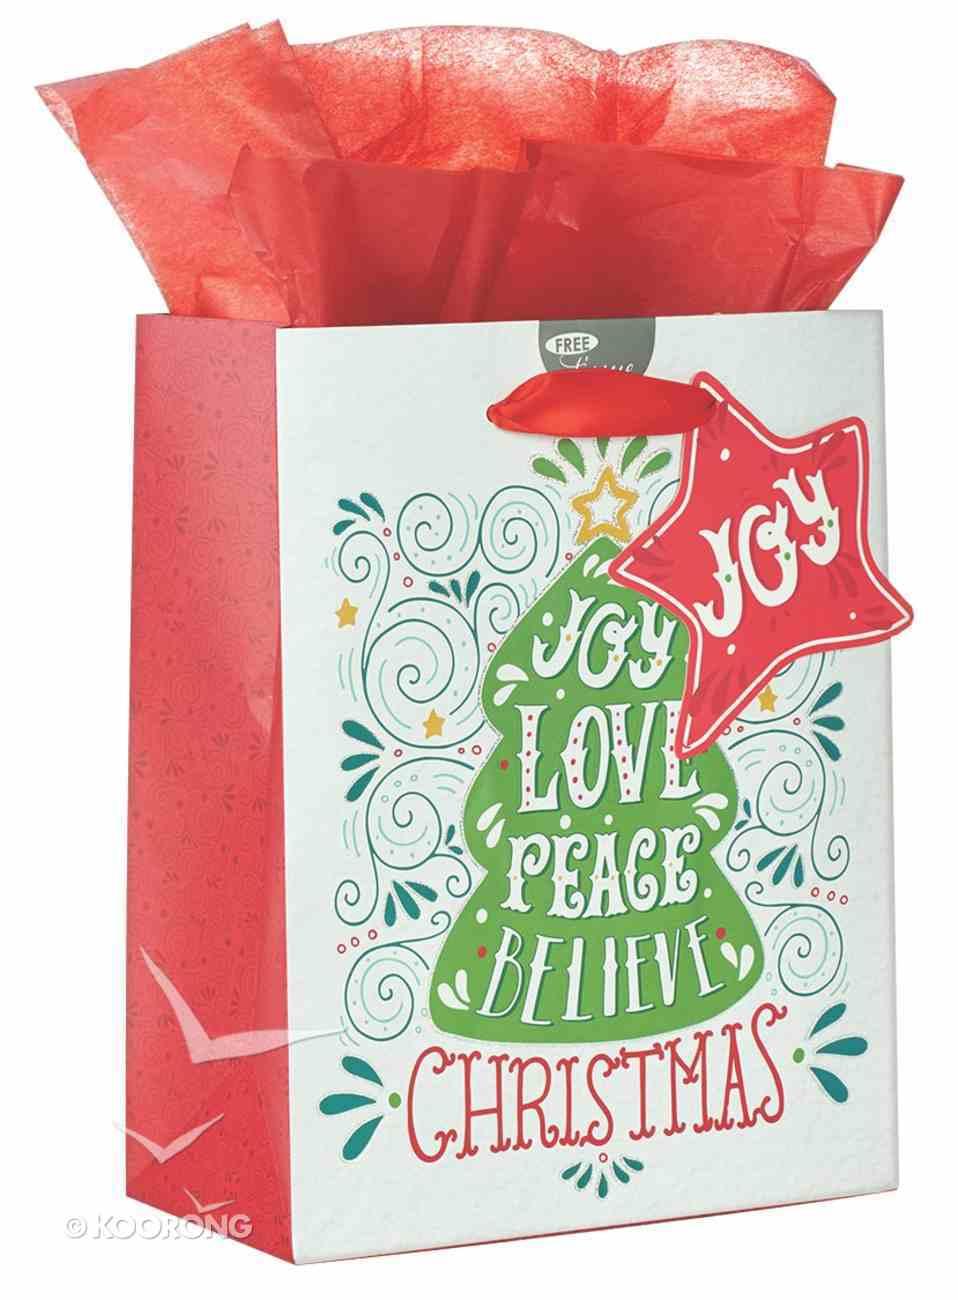 Christmas Gift Bag Medium: Joy, Love, Peace With Tissue Paper, Gift Tag & Satin Ribbon Handles Stationery